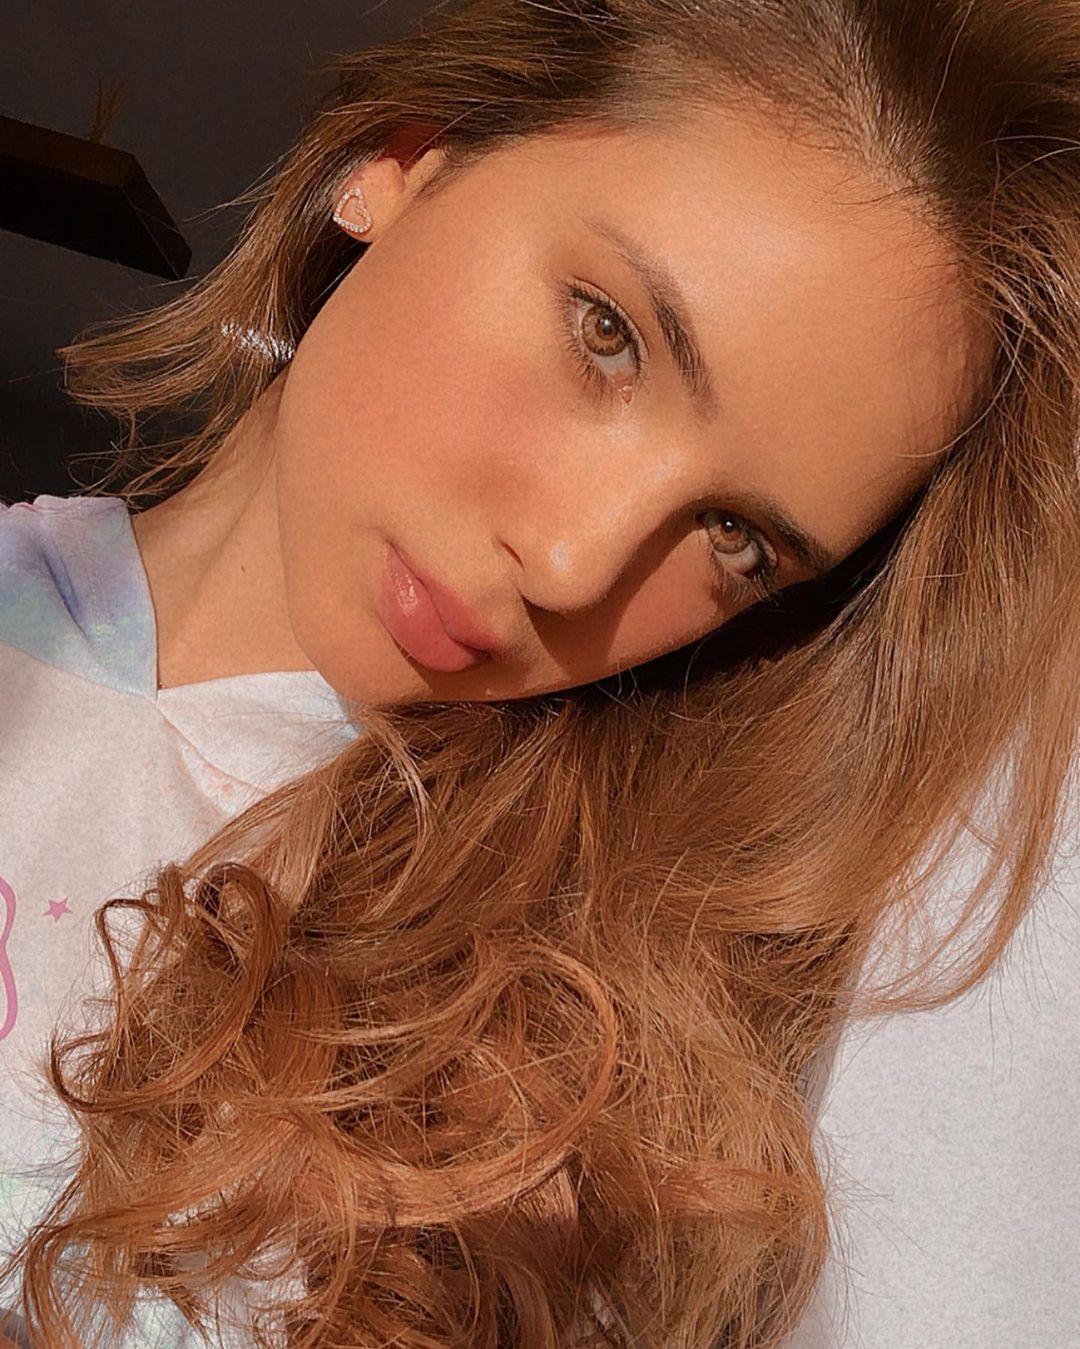 Anabel-Ramirez-Wallpapers-Insta-Fit-Bio-2